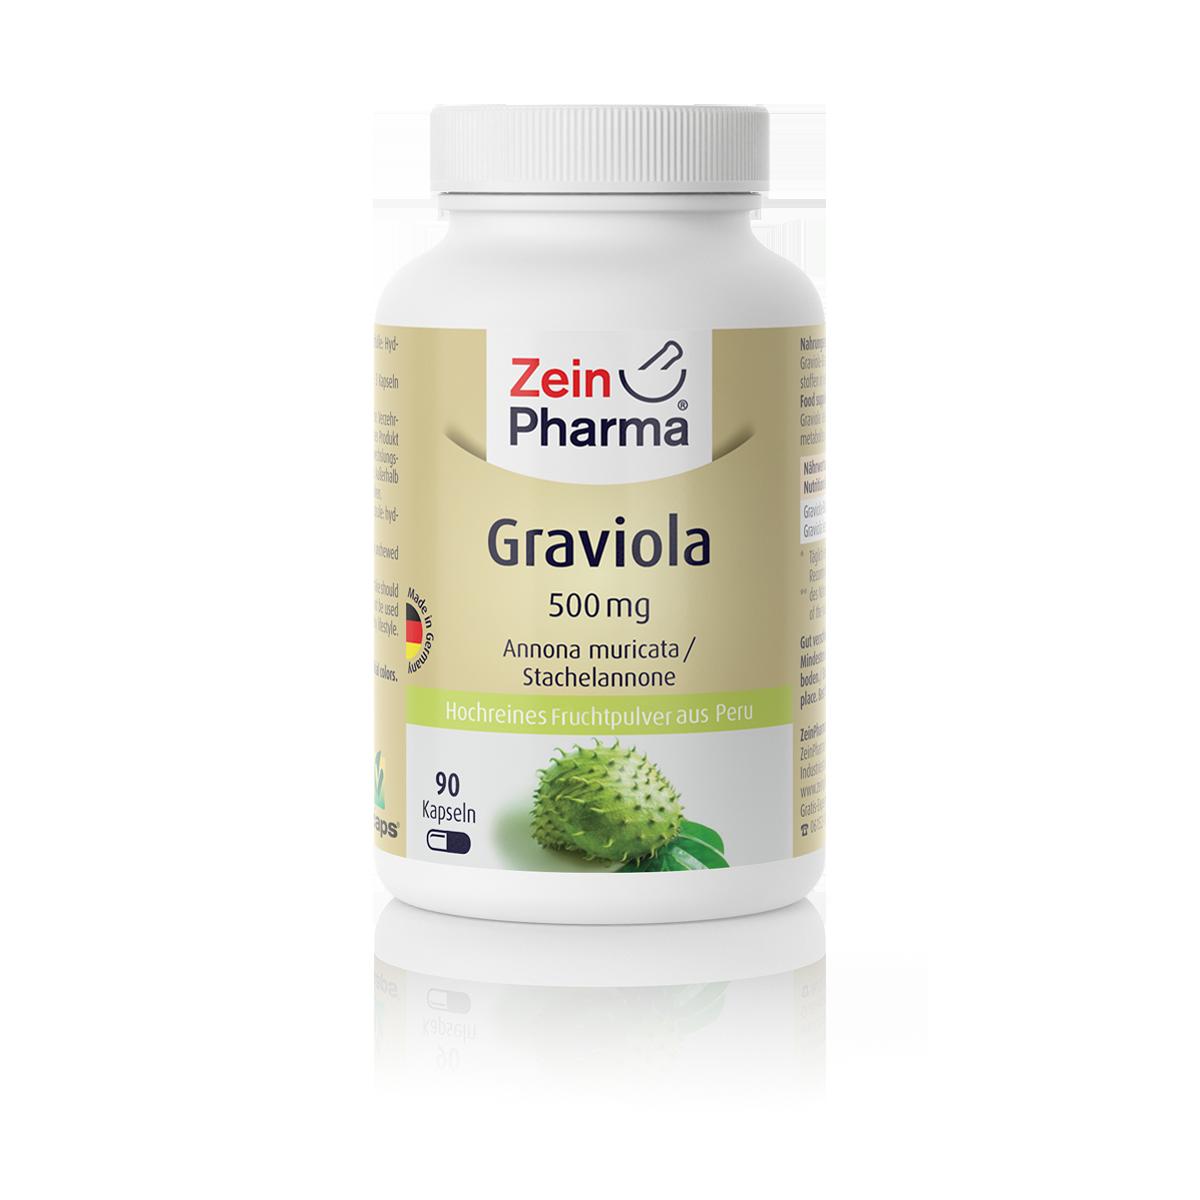 Zeinpharma Graviola 500 mg Kapseln